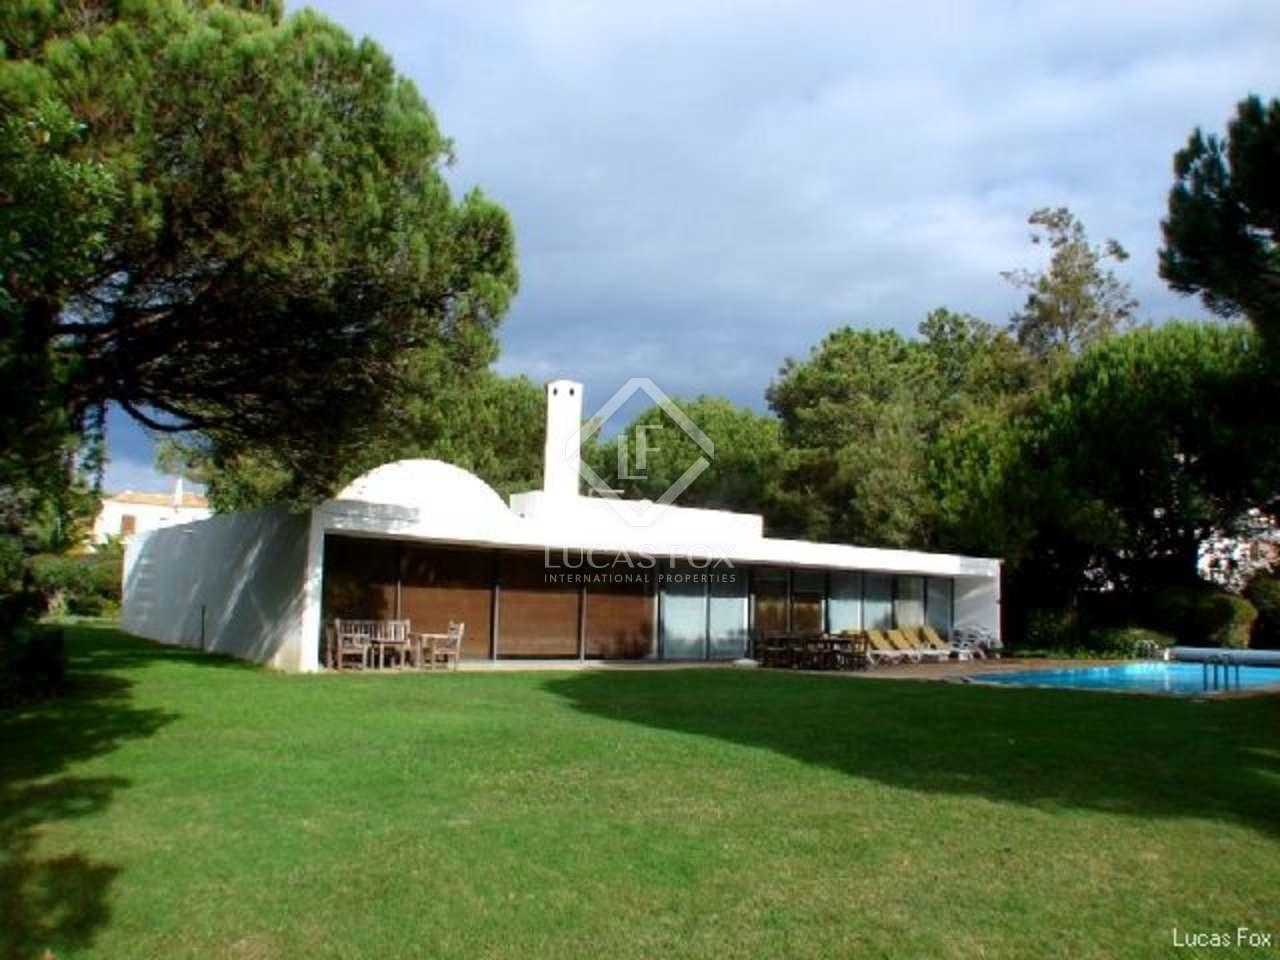 350m haus villa zum verkauf in algarve portugal. Black Bedroom Furniture Sets. Home Design Ideas